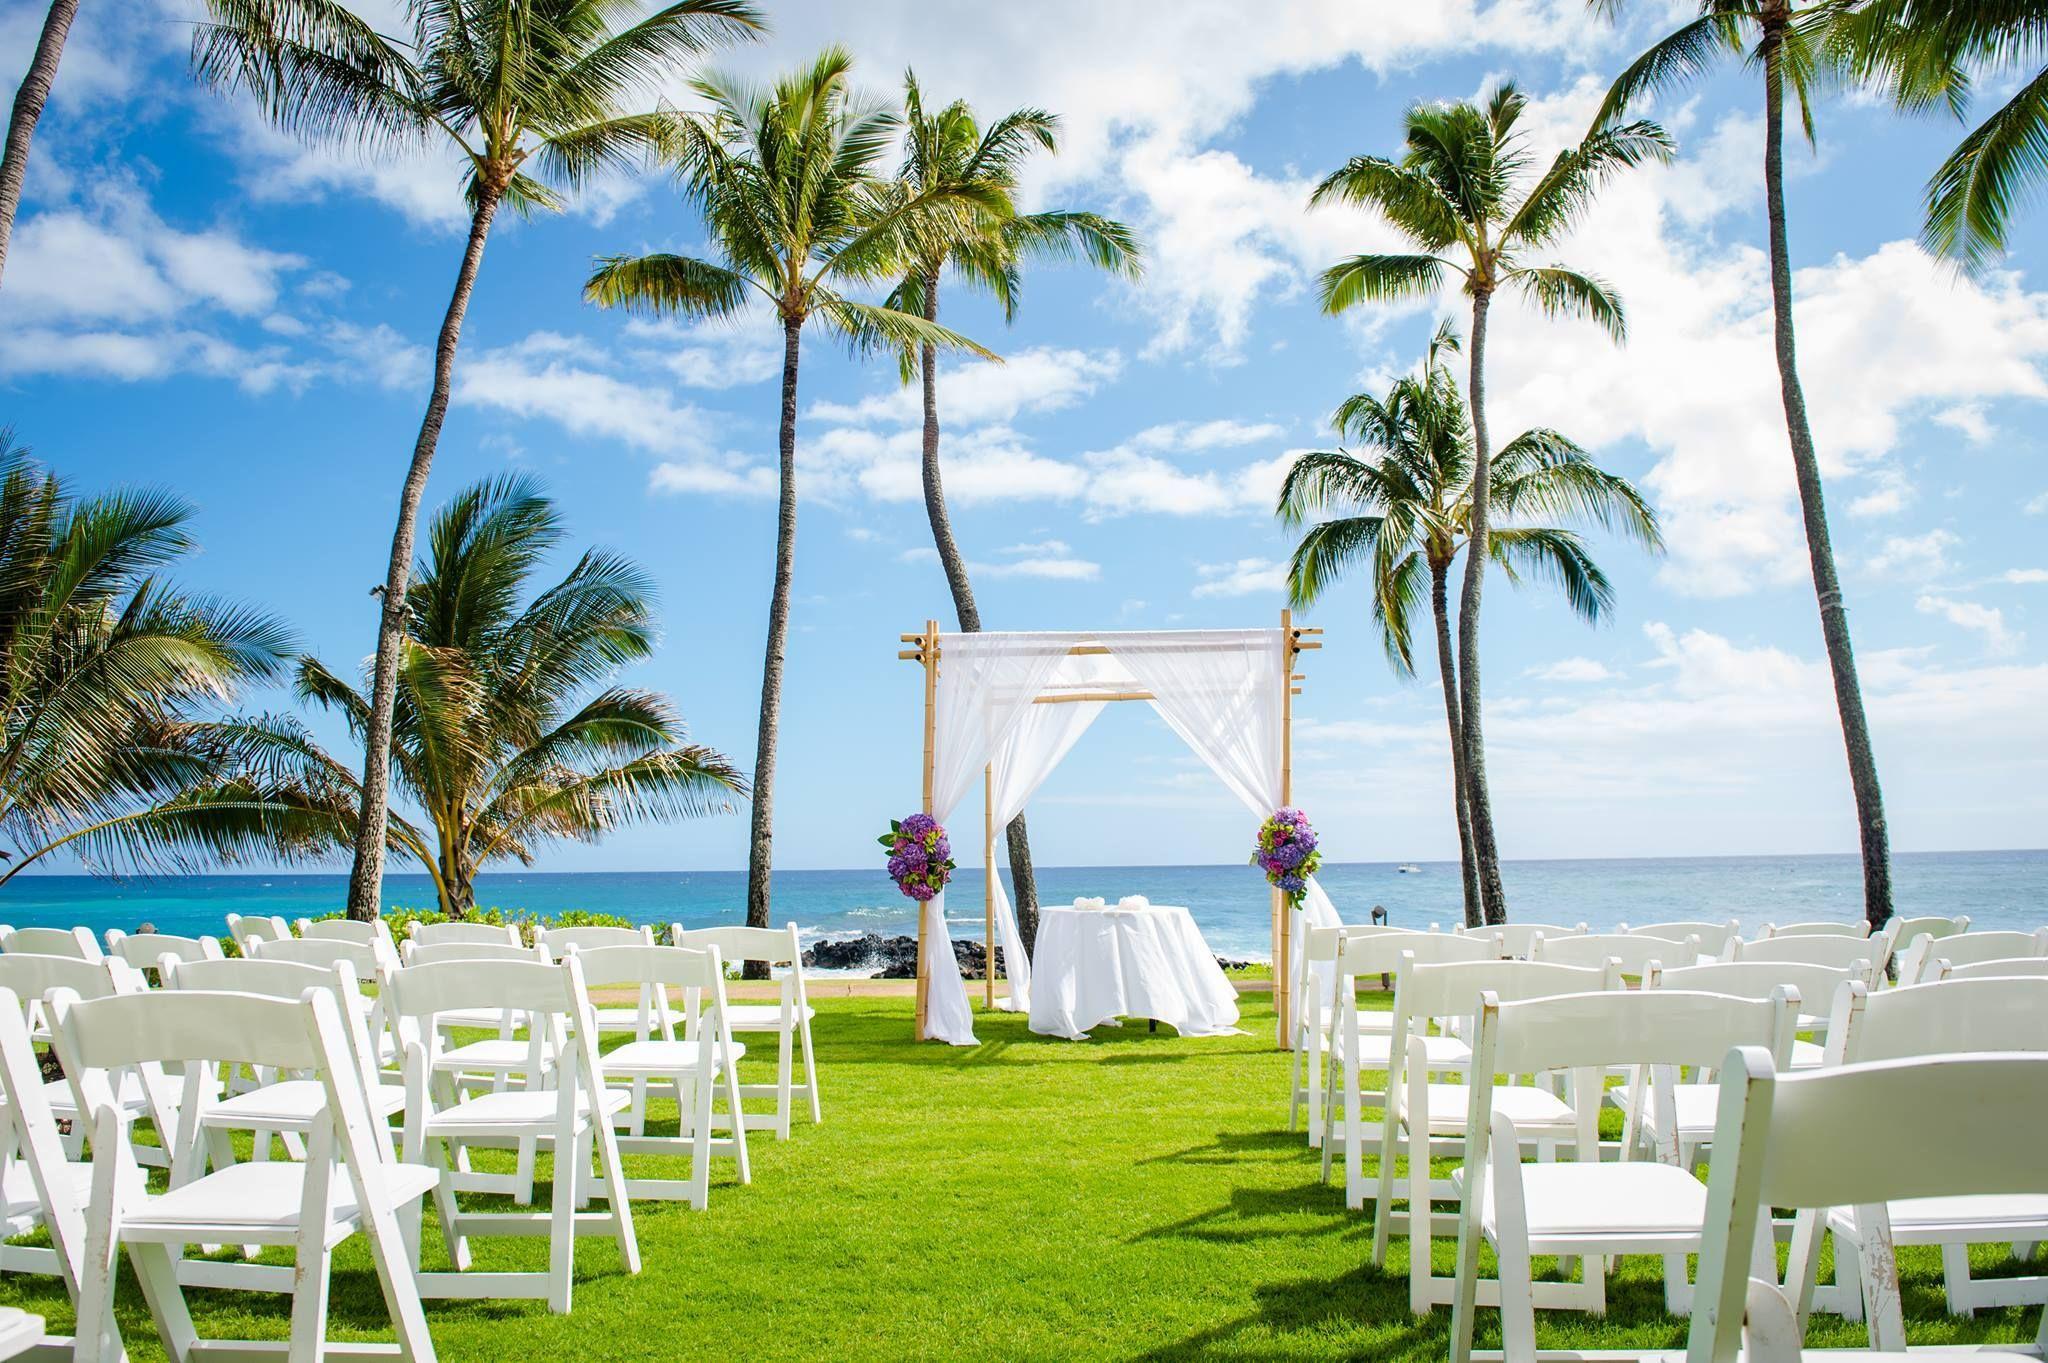 Colorful Kauai Hawaii Wedding Ceremony Beach Venue Sheraton Resort Coordination